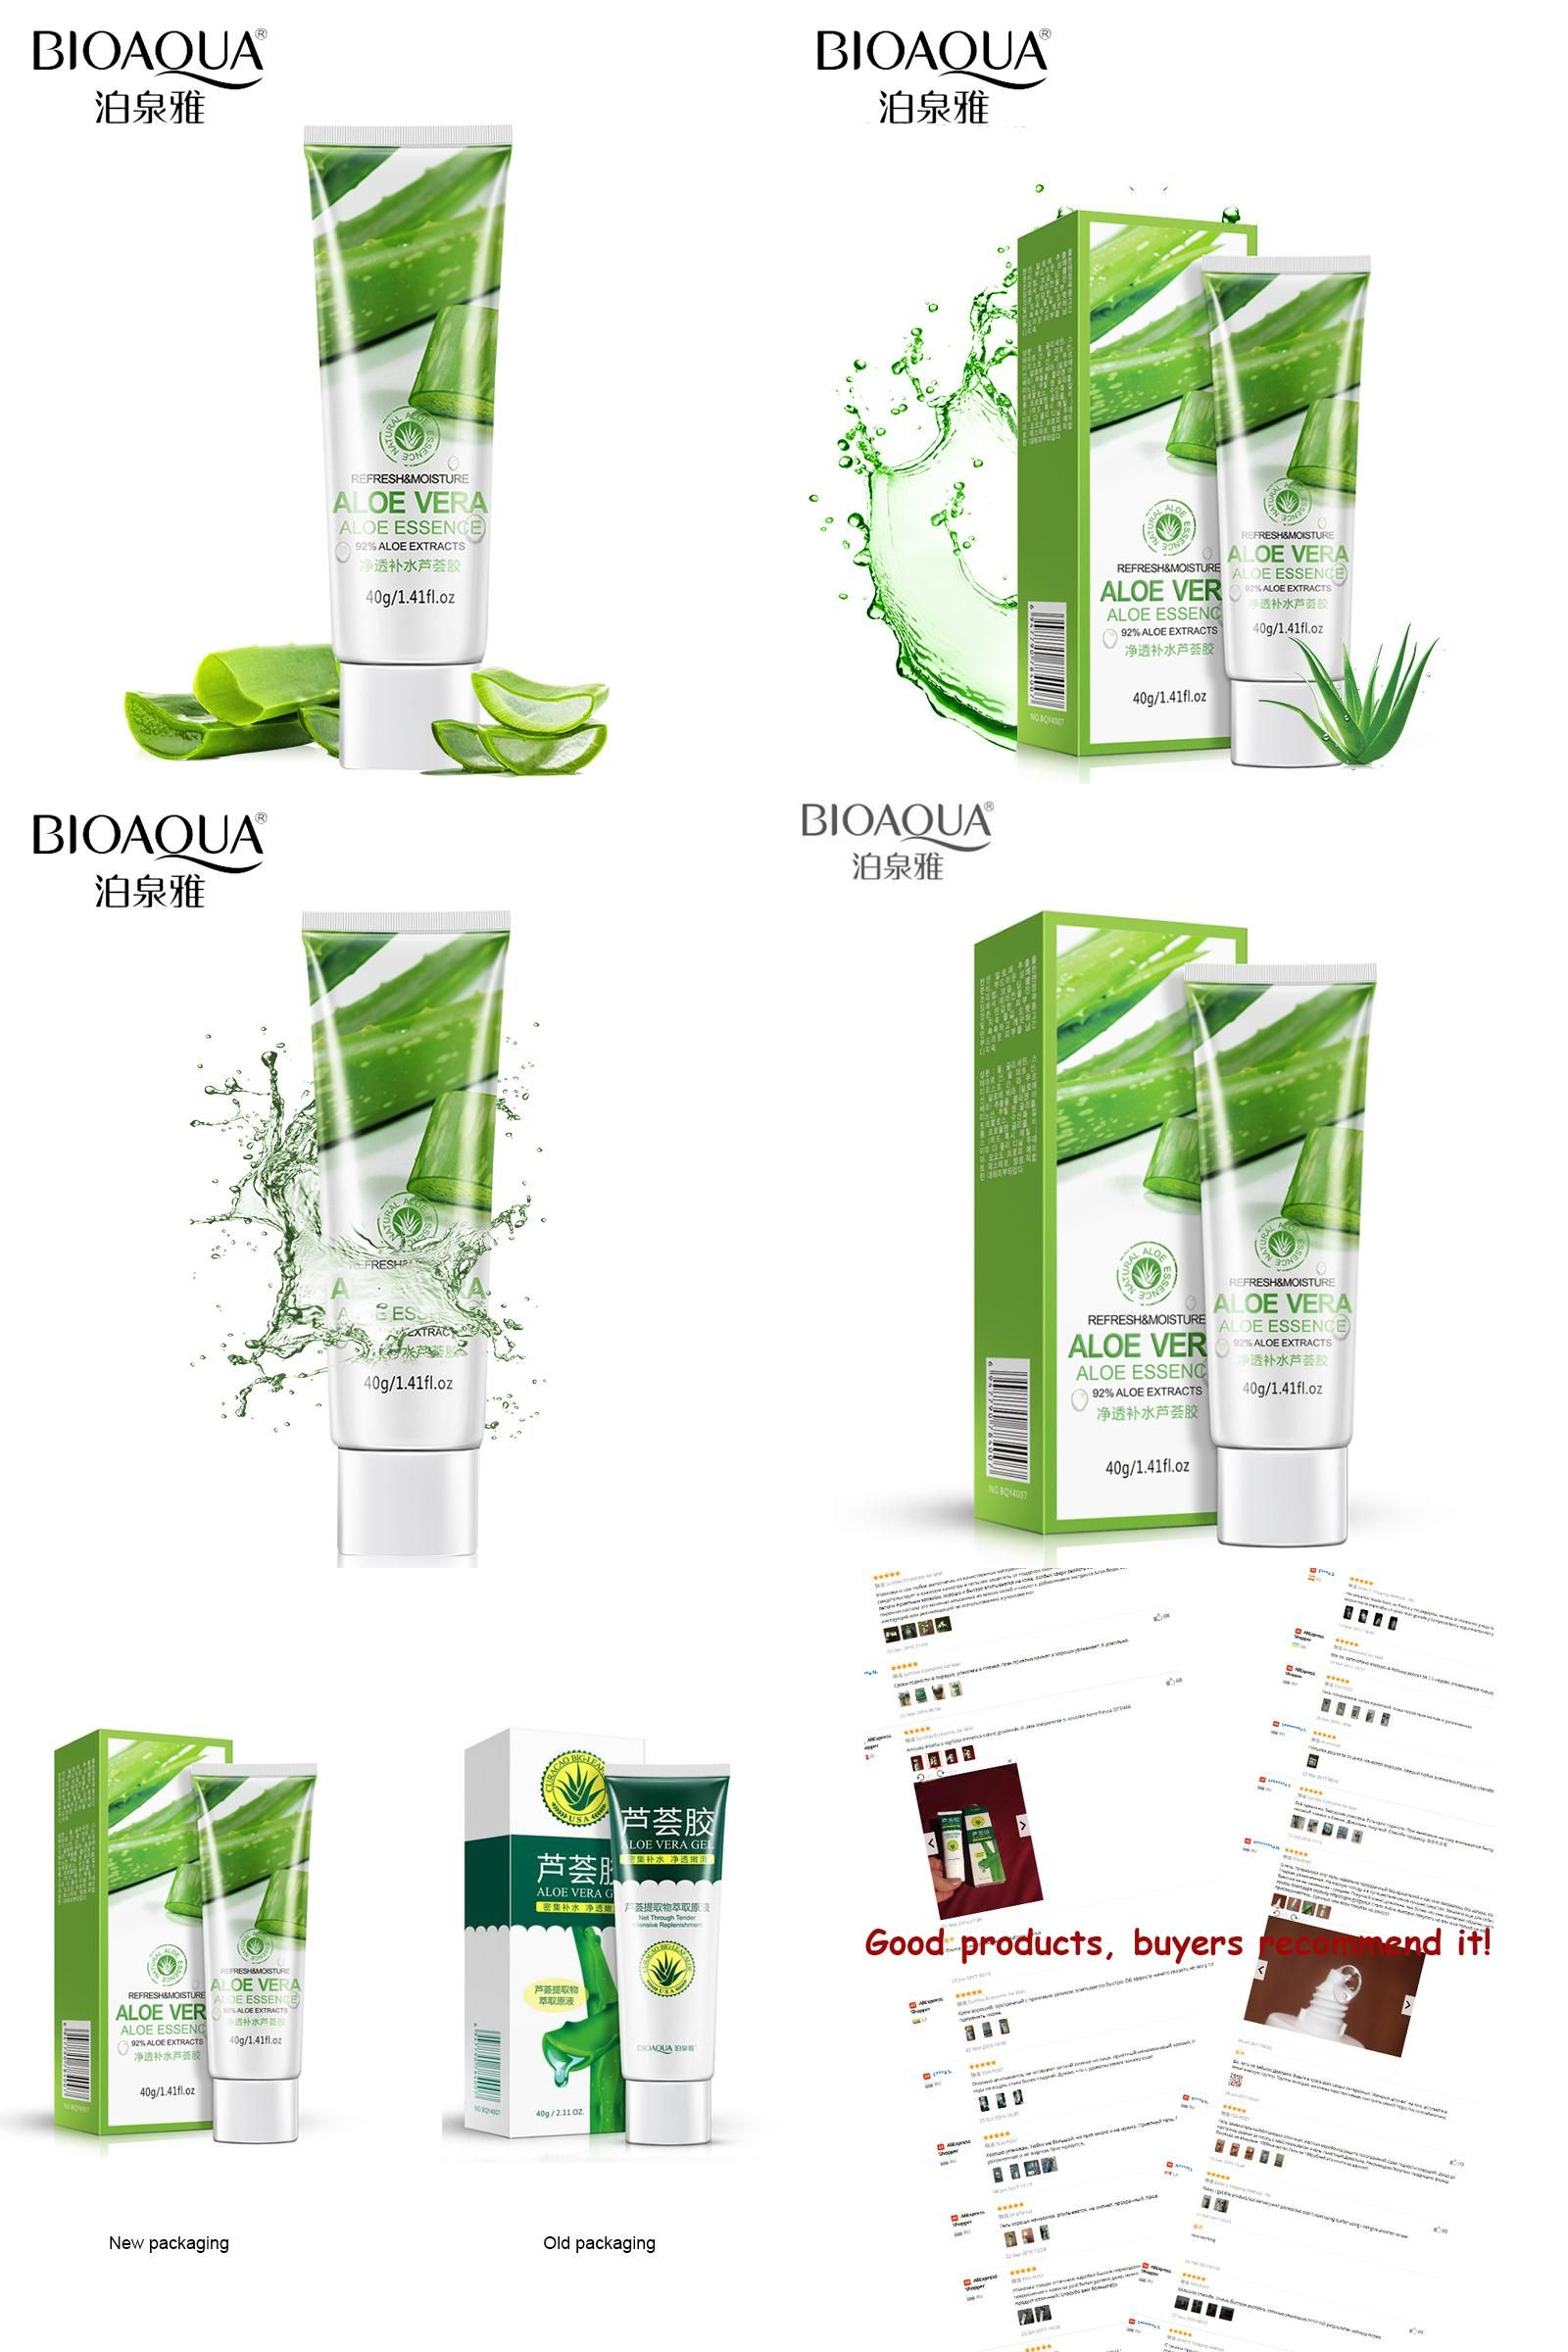 Visit To Buy Bioaqua Brand 40g Aloe Vera Gel Skin Care Face Cream Aloevera Hyaluronic